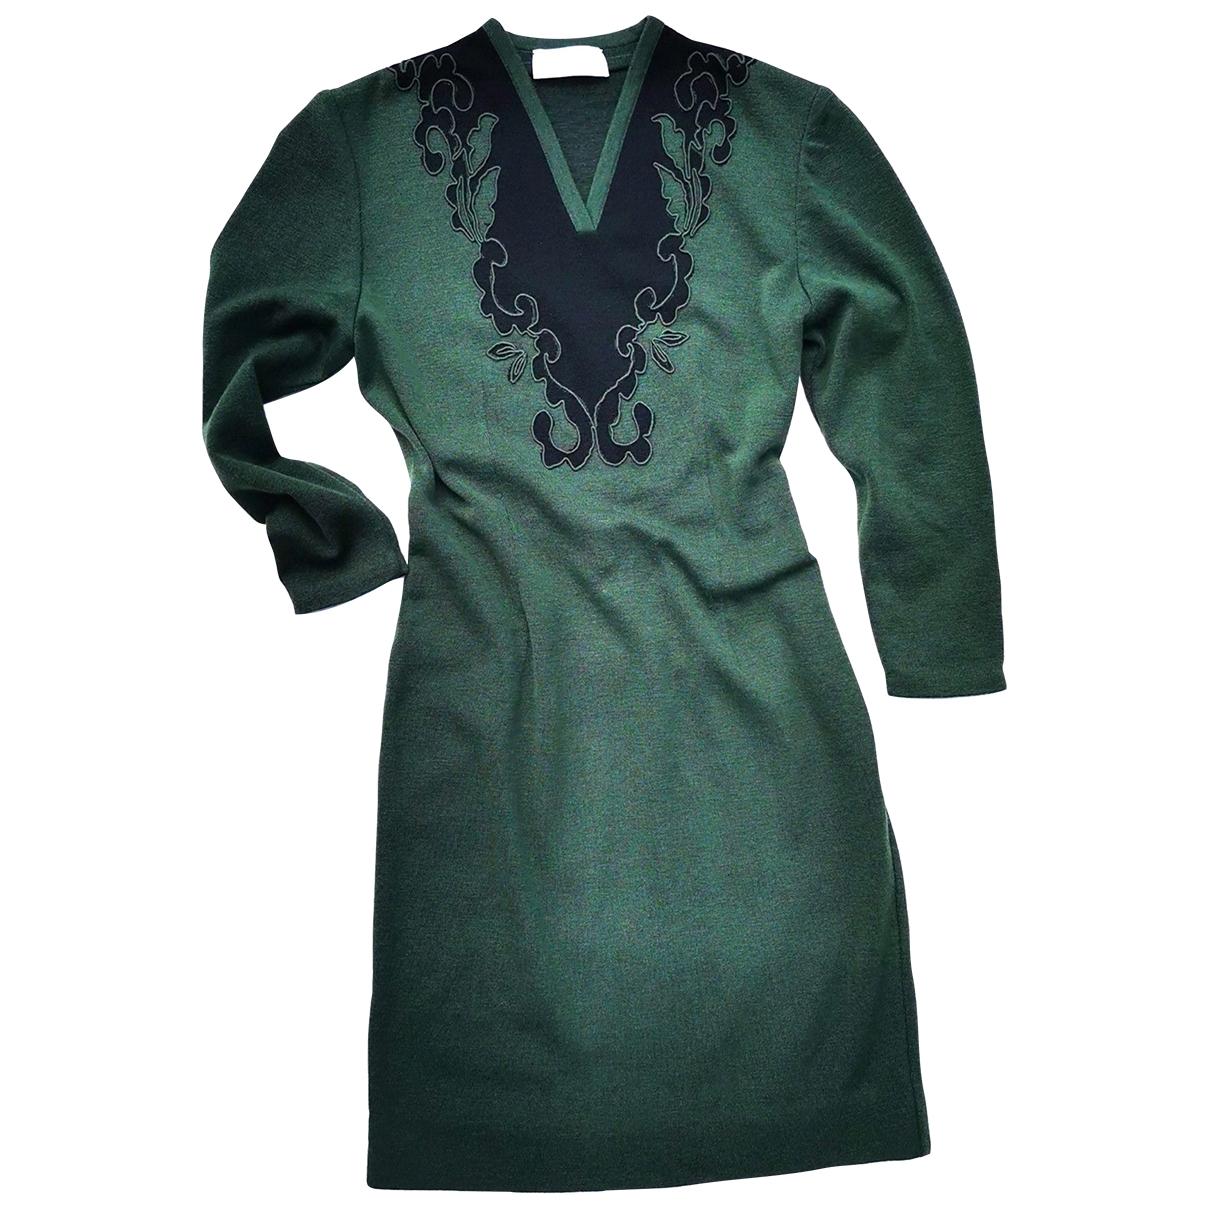 Nina Ricci \N Kleid in  Gruen Wolle